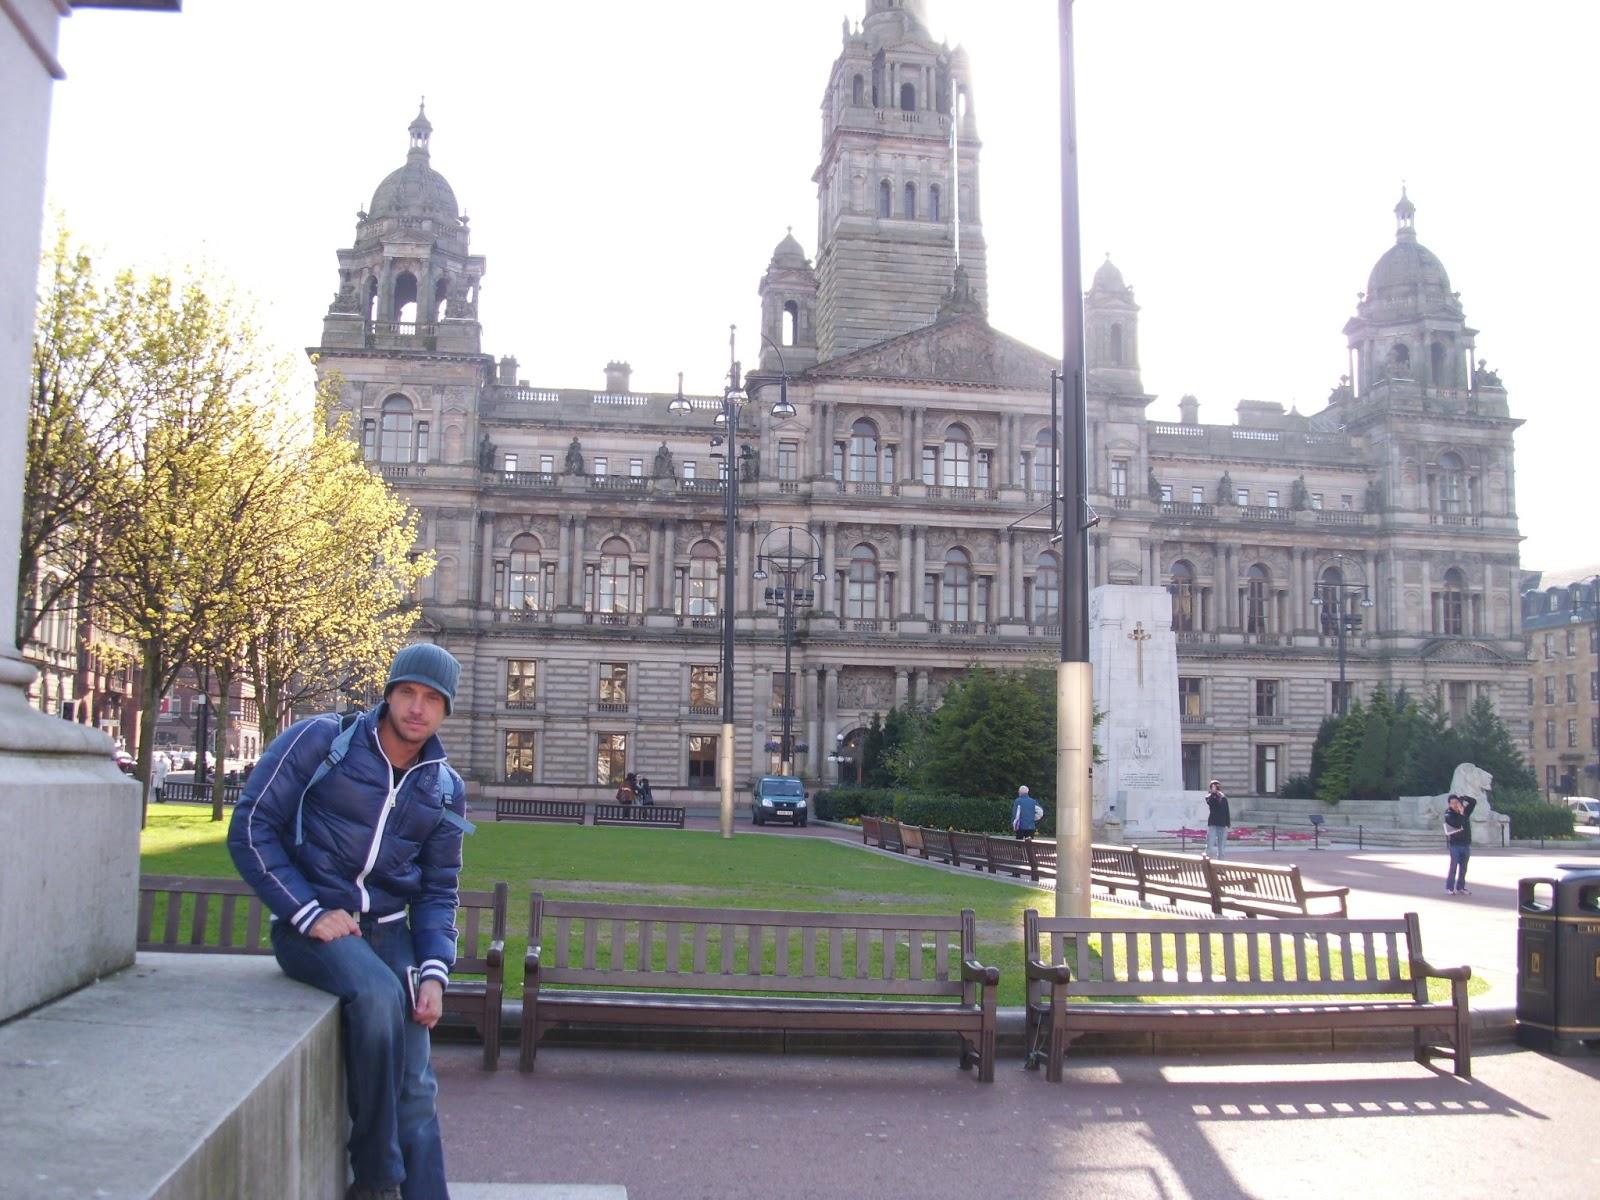 Escocia glasgow edimburgo y lago ness paperblog for Oficina de turismo de escocia